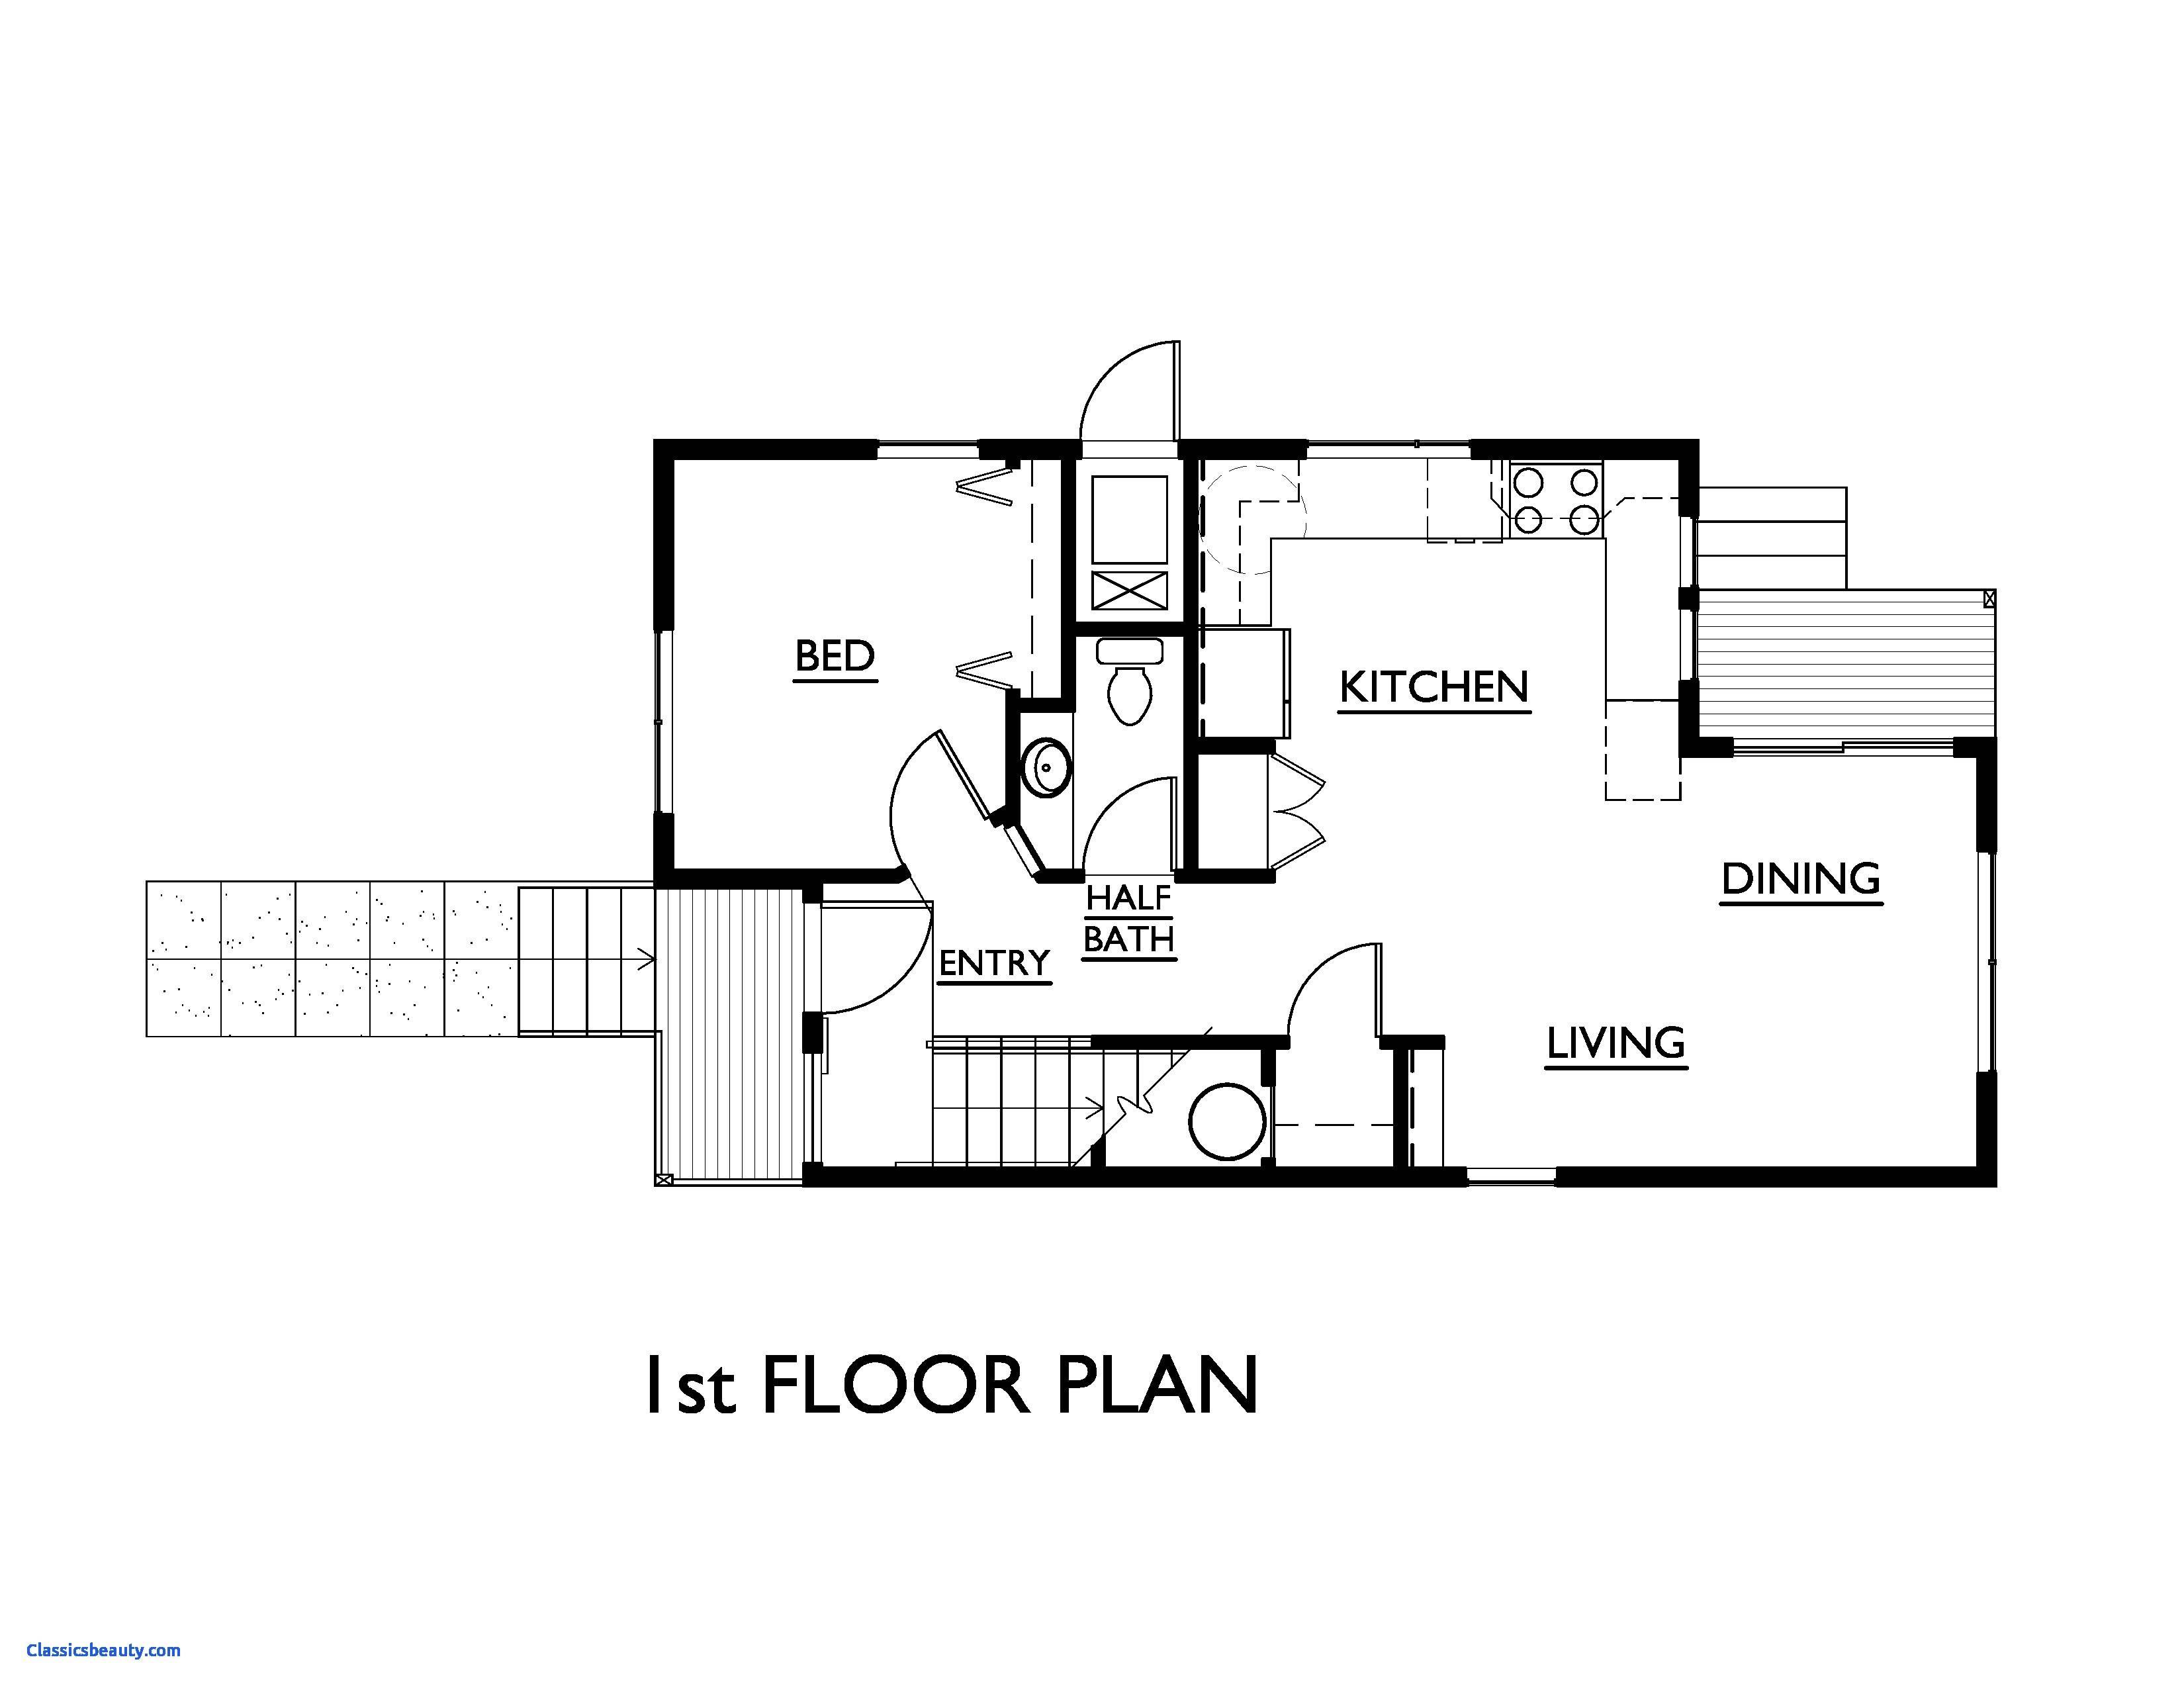 Awesome Simple House Floor Plans Measurements Home Home Plans Blueprints 98222